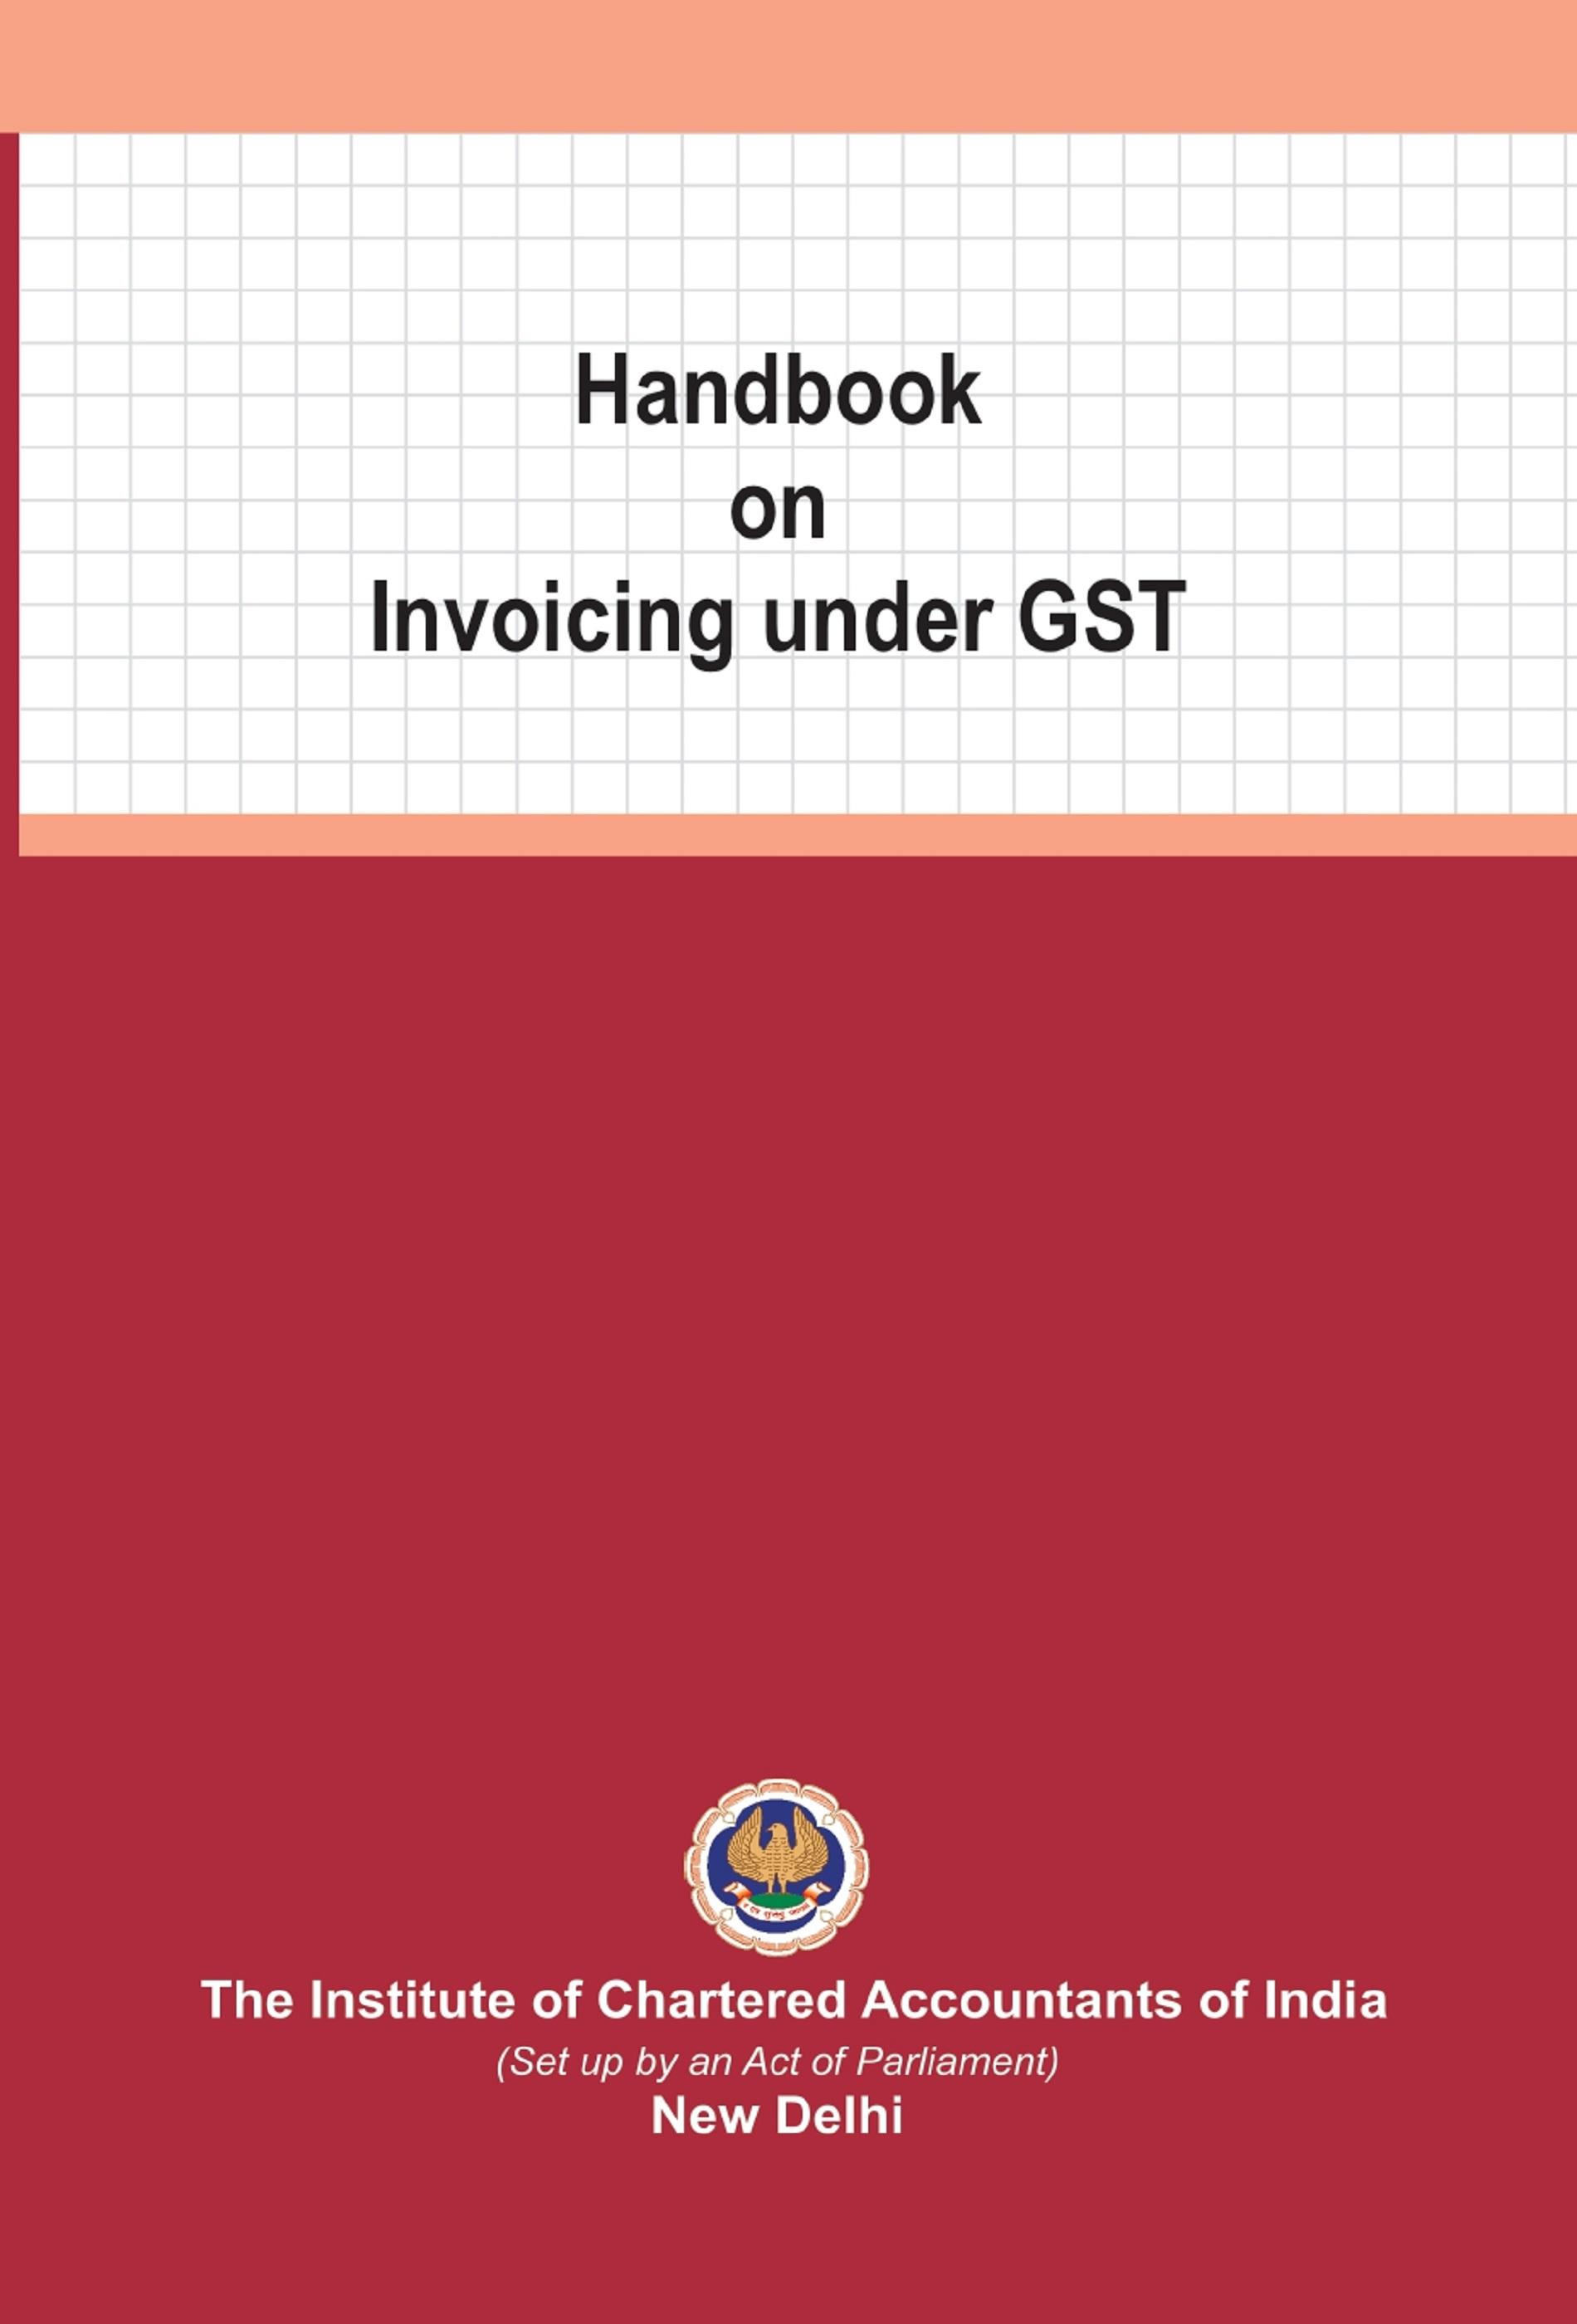 Handbook on Invoicing under GST (May, 2020)